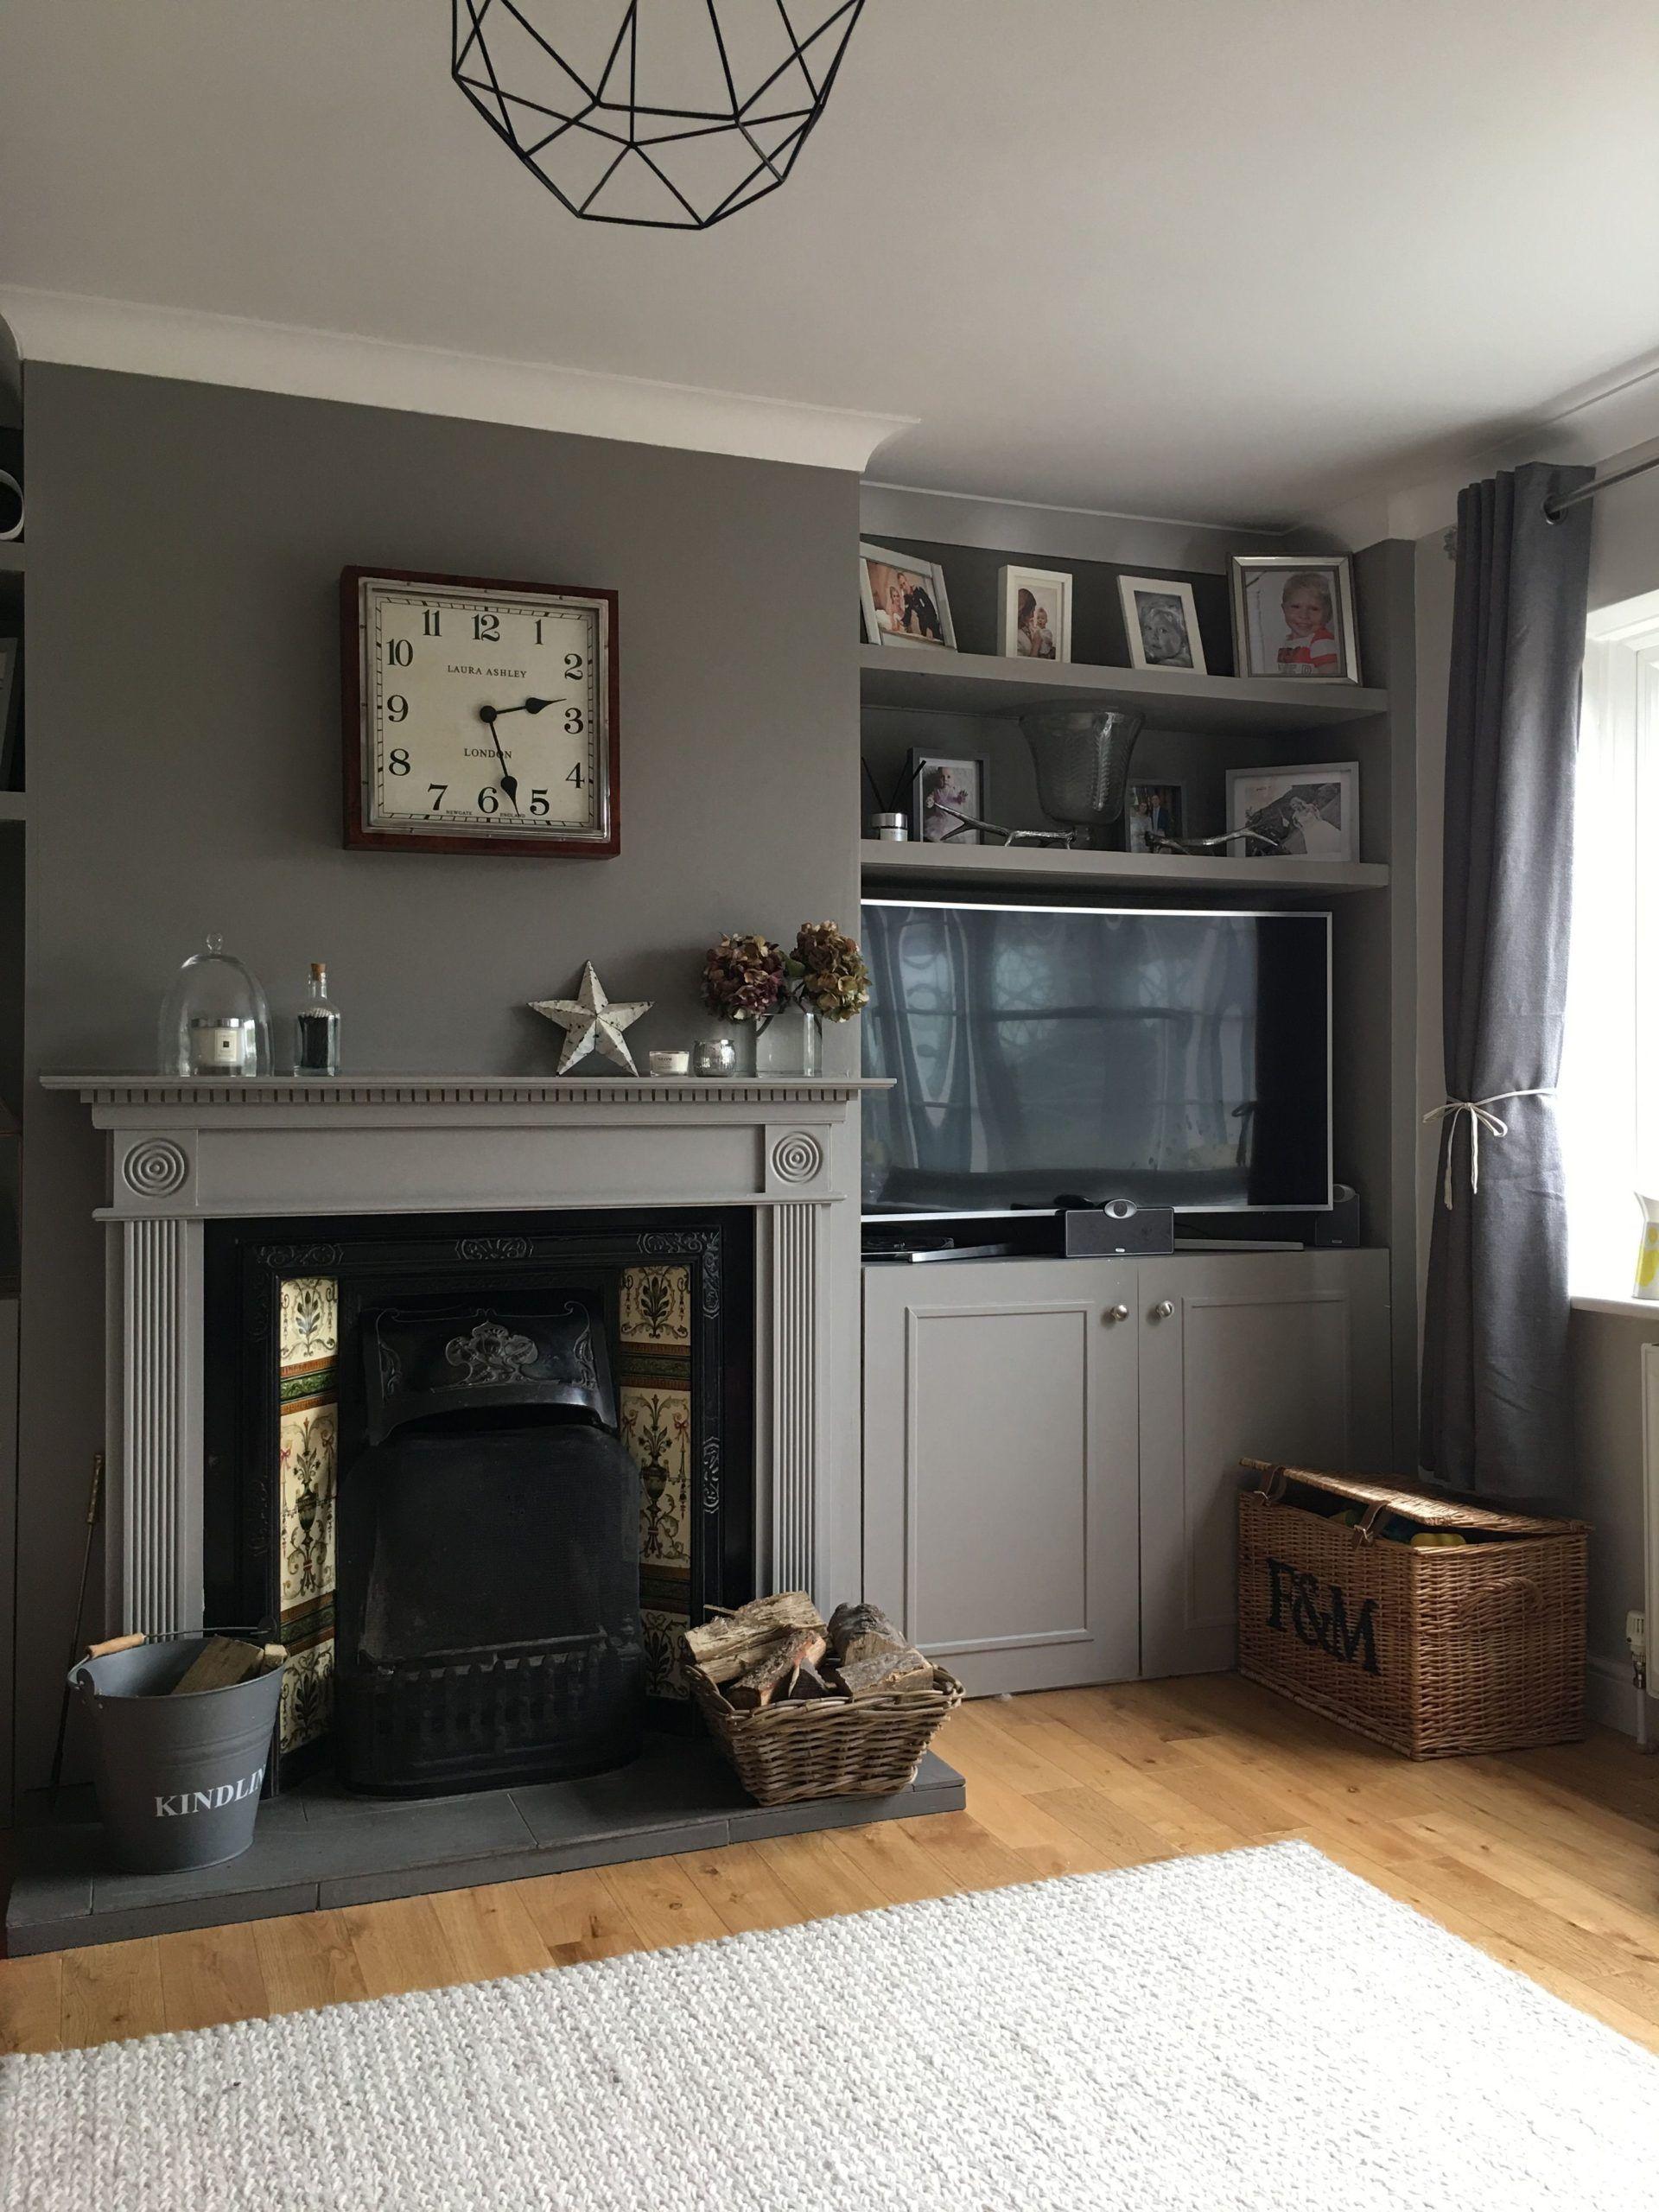 Gute Kostenlose Lagerungsideen Für Feuerstellen Kamin Kostenlos Gut Herde Ideen Alcove Ideas Living Room Living Room Decor Fireplace Victorian Living Room